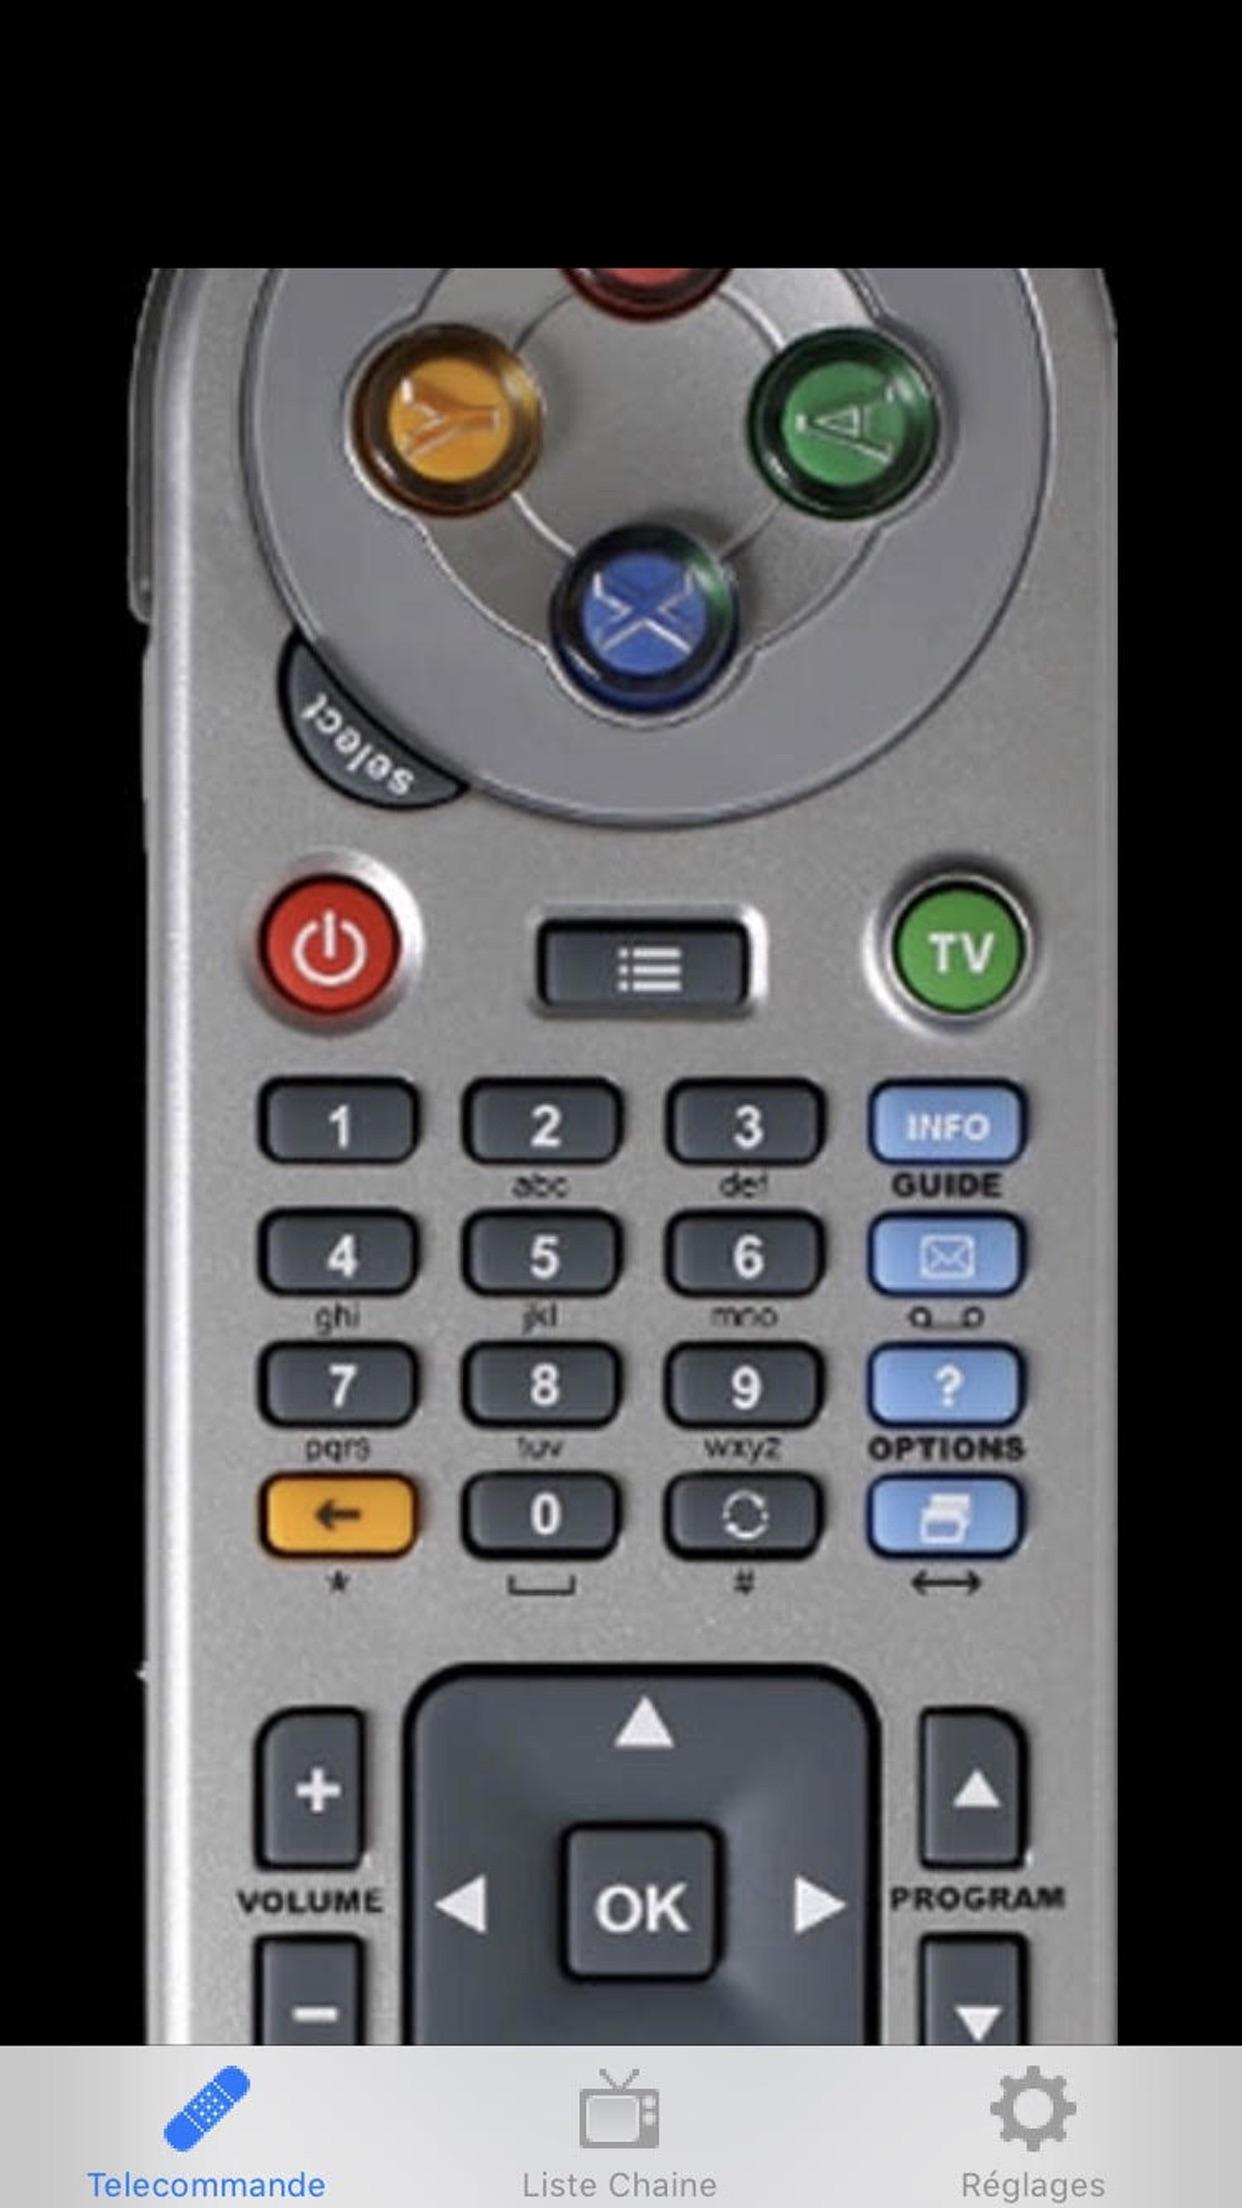 Freebox Telecommande Screenshot